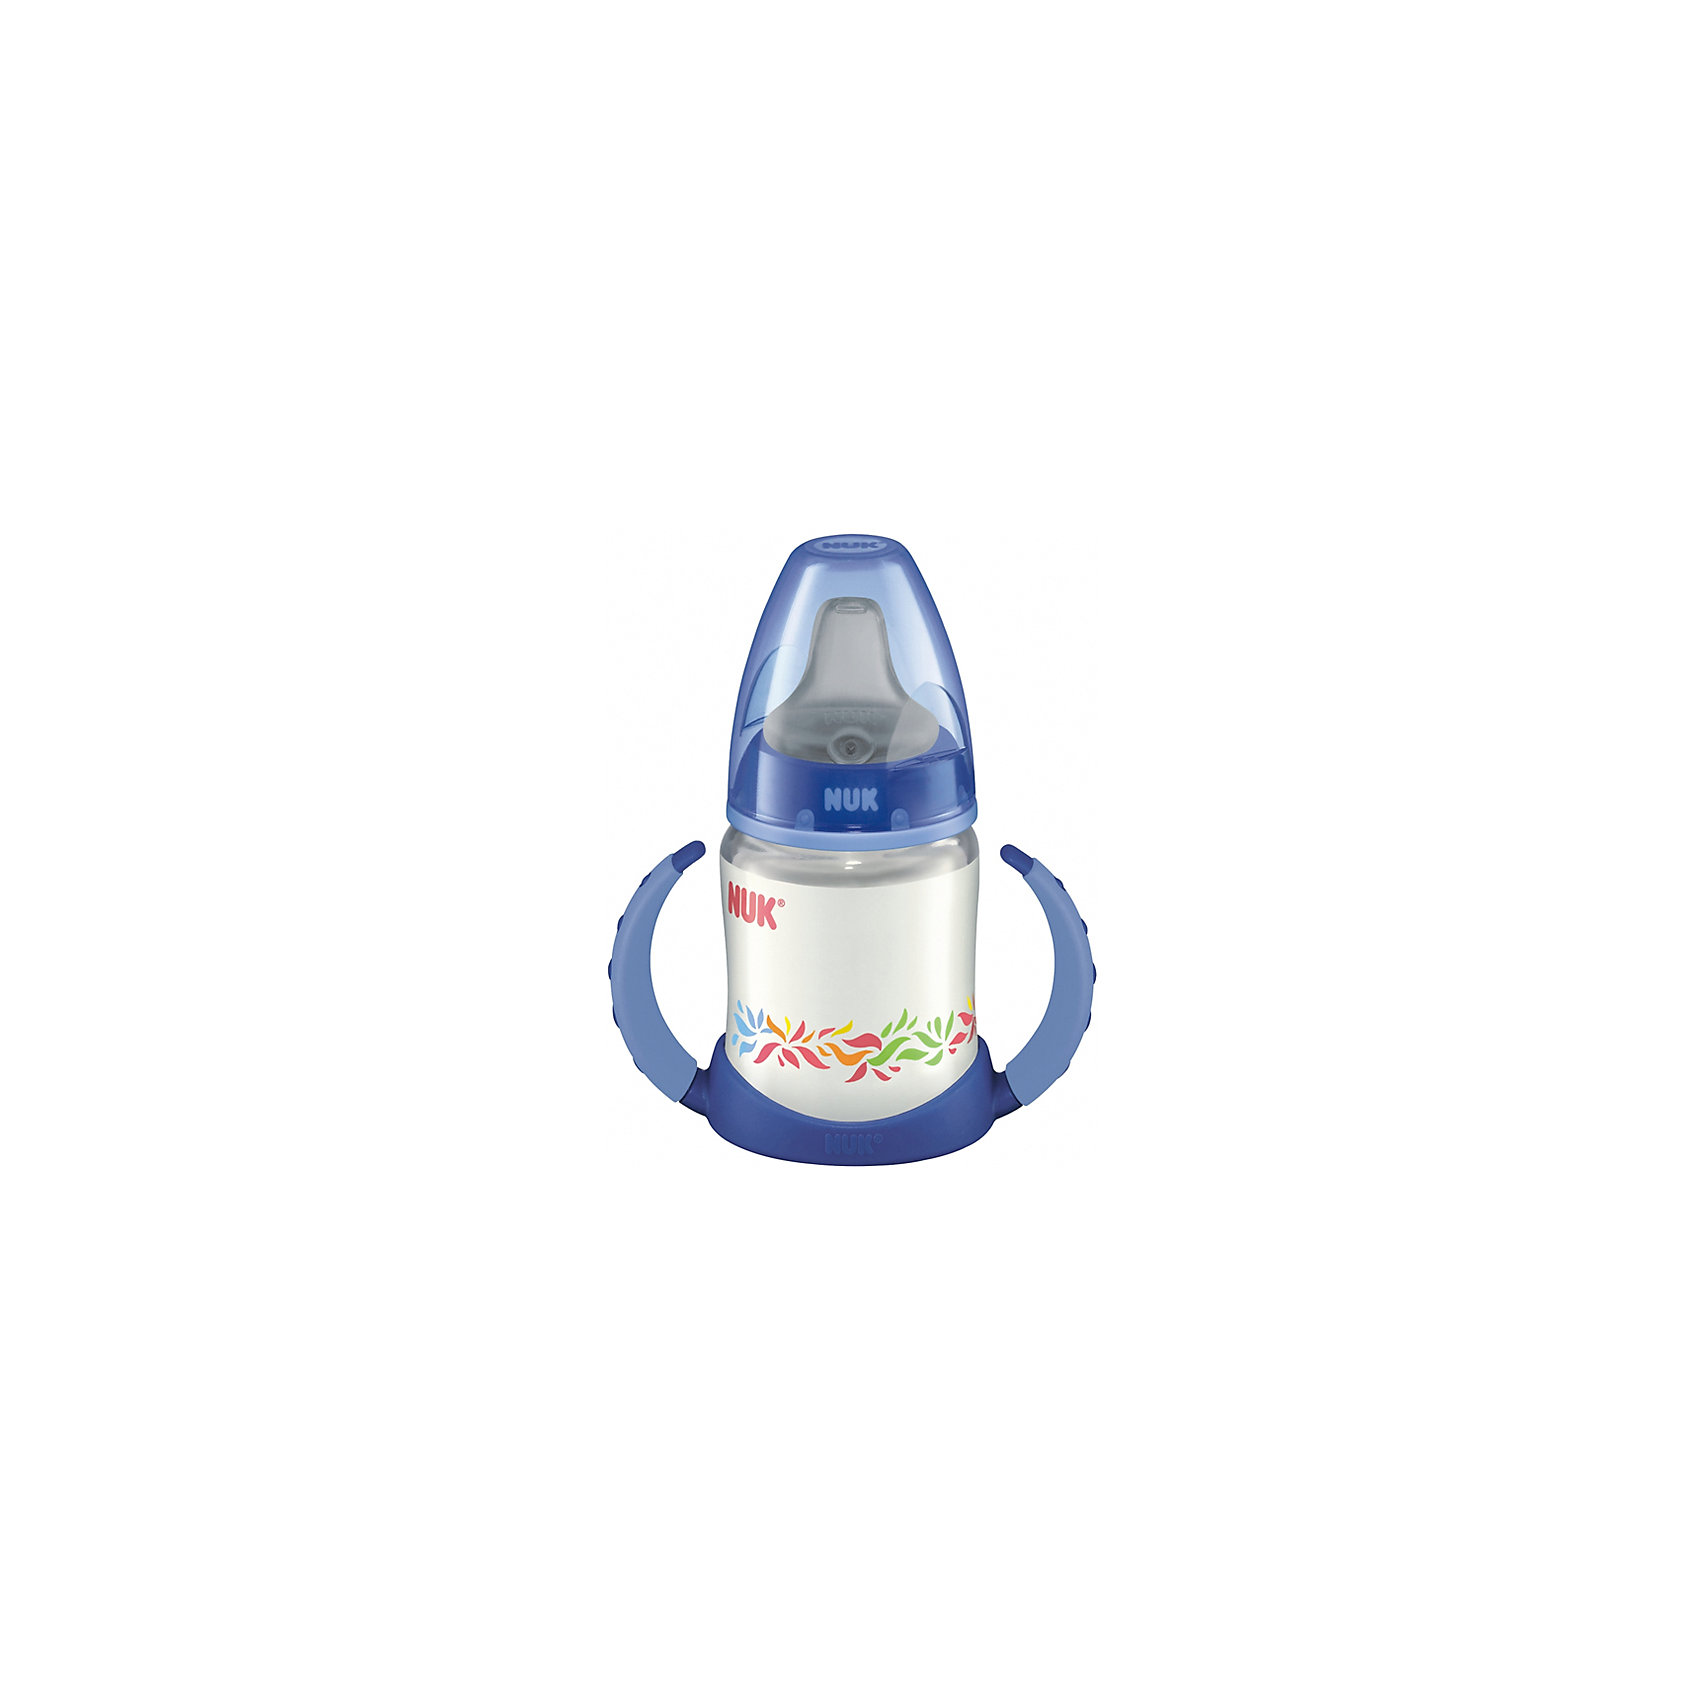 NUK Бутылочка First Choice-поильник, 150 мл., NUK, синий